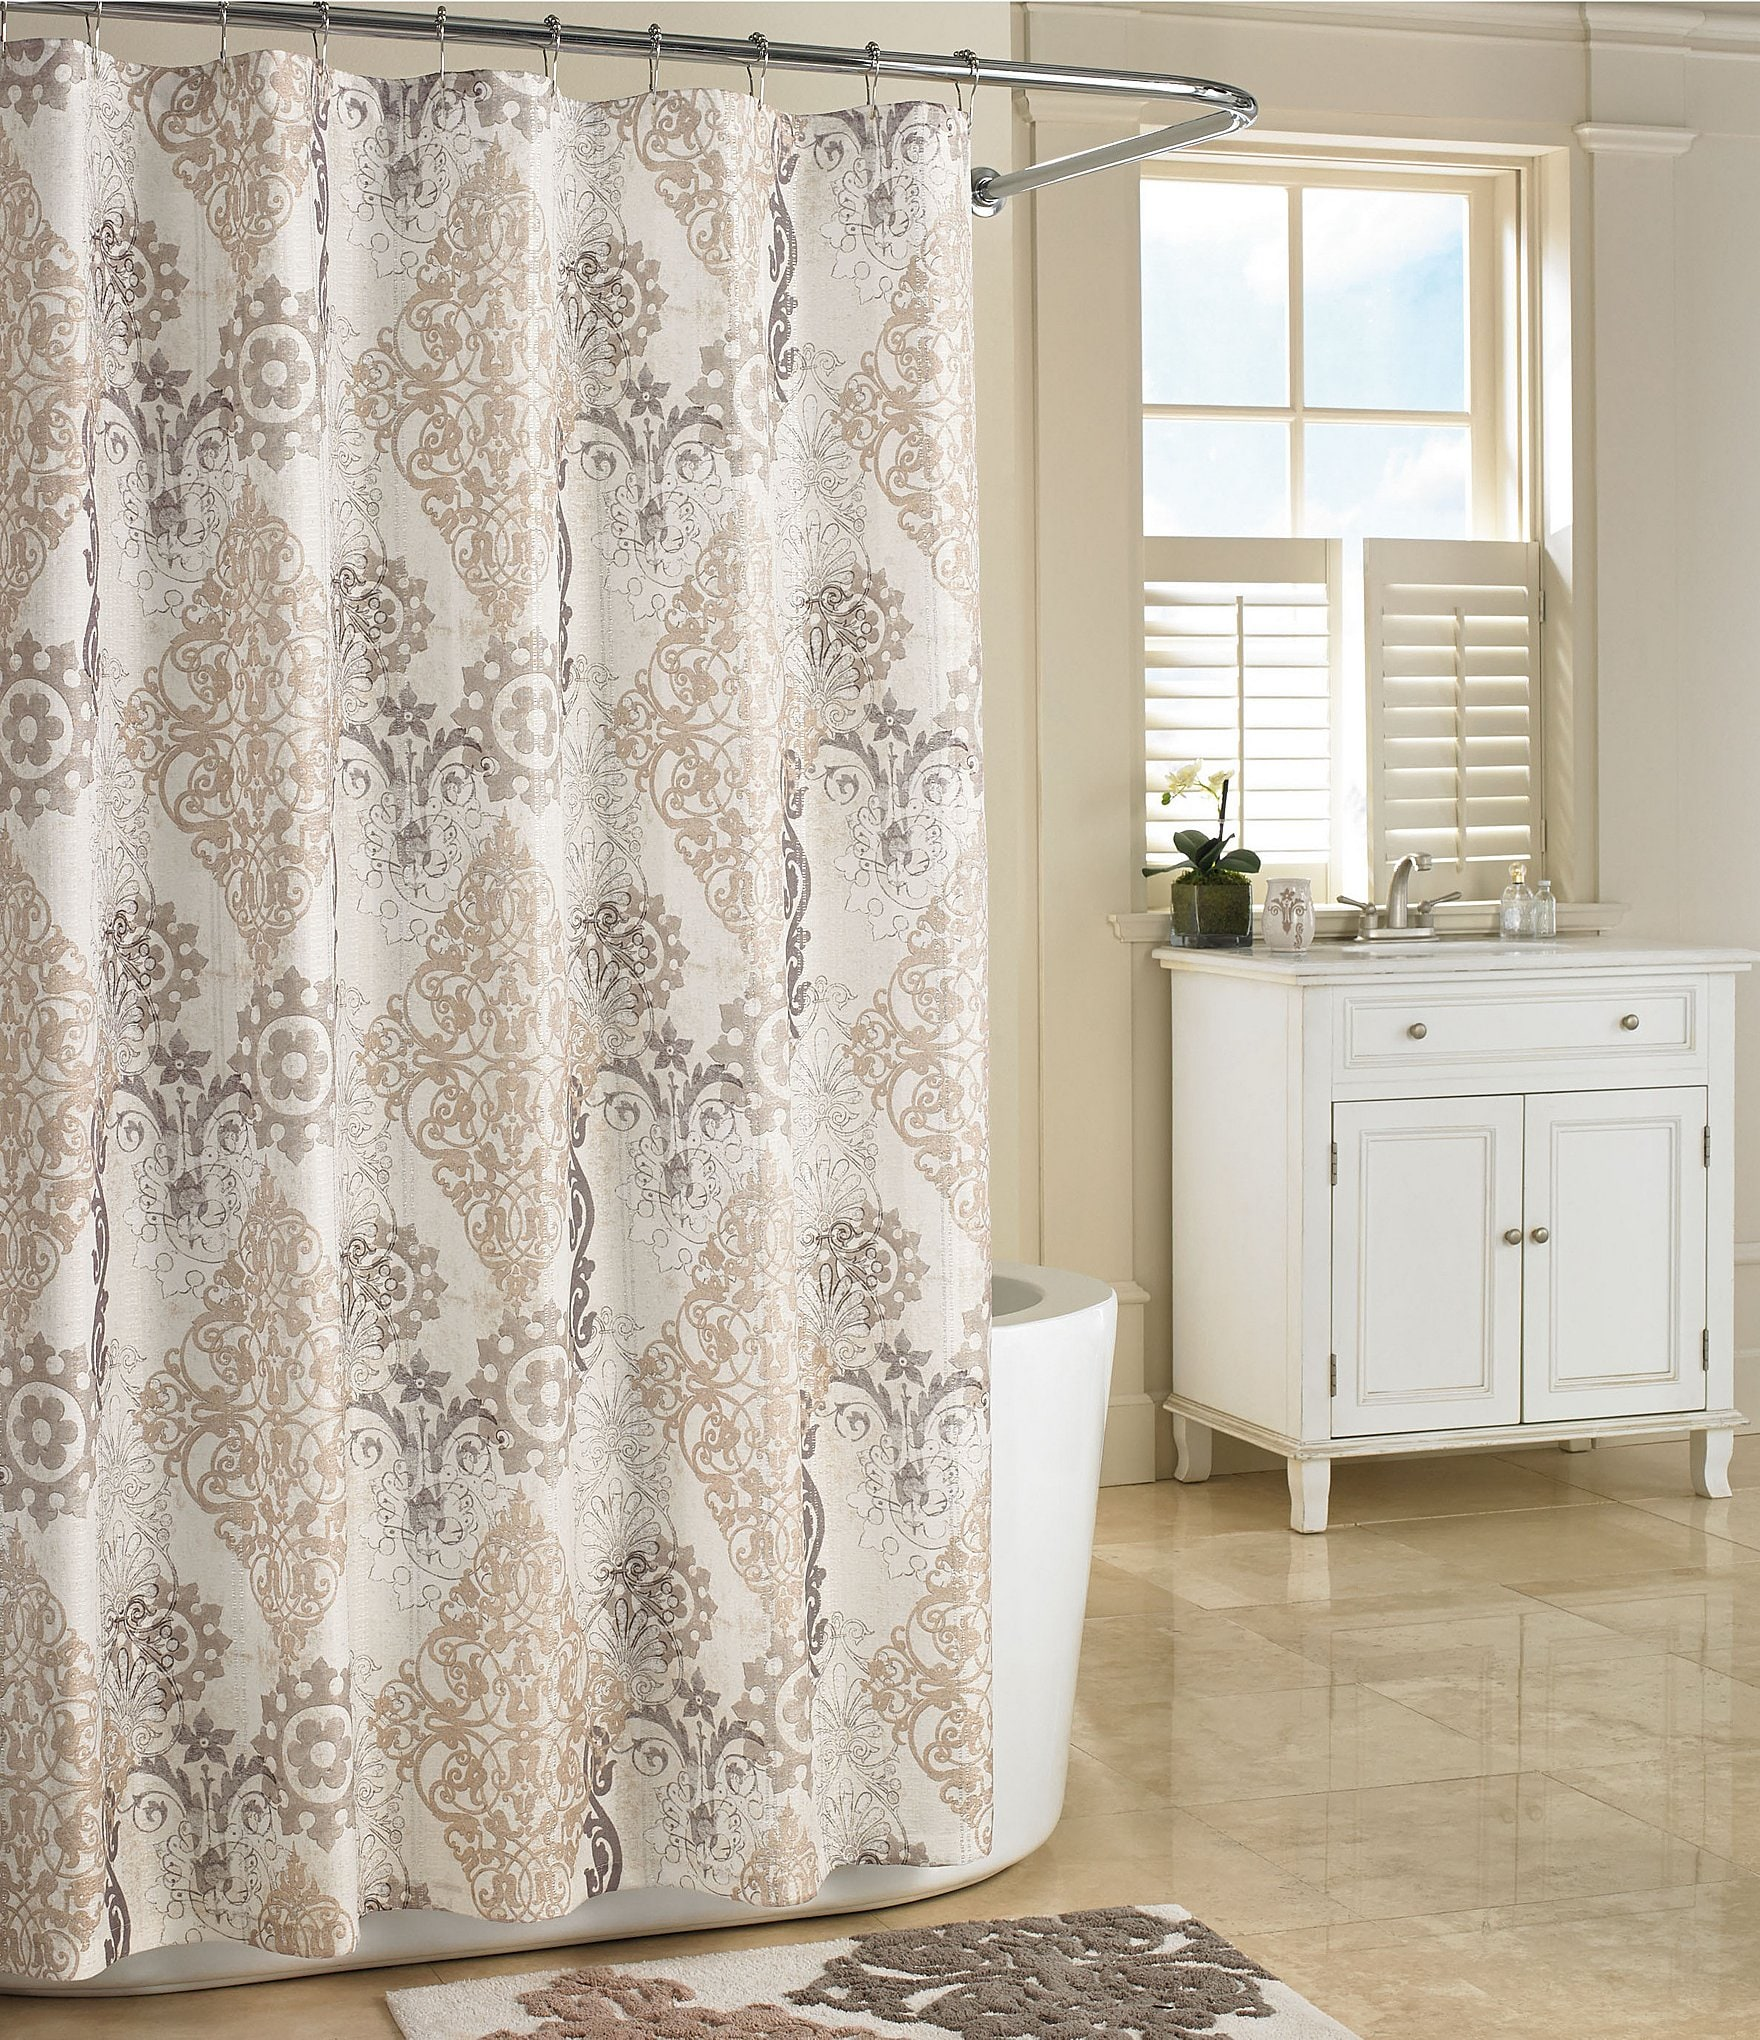 Tahari shower curtains - Tahari Shower Curtains 50